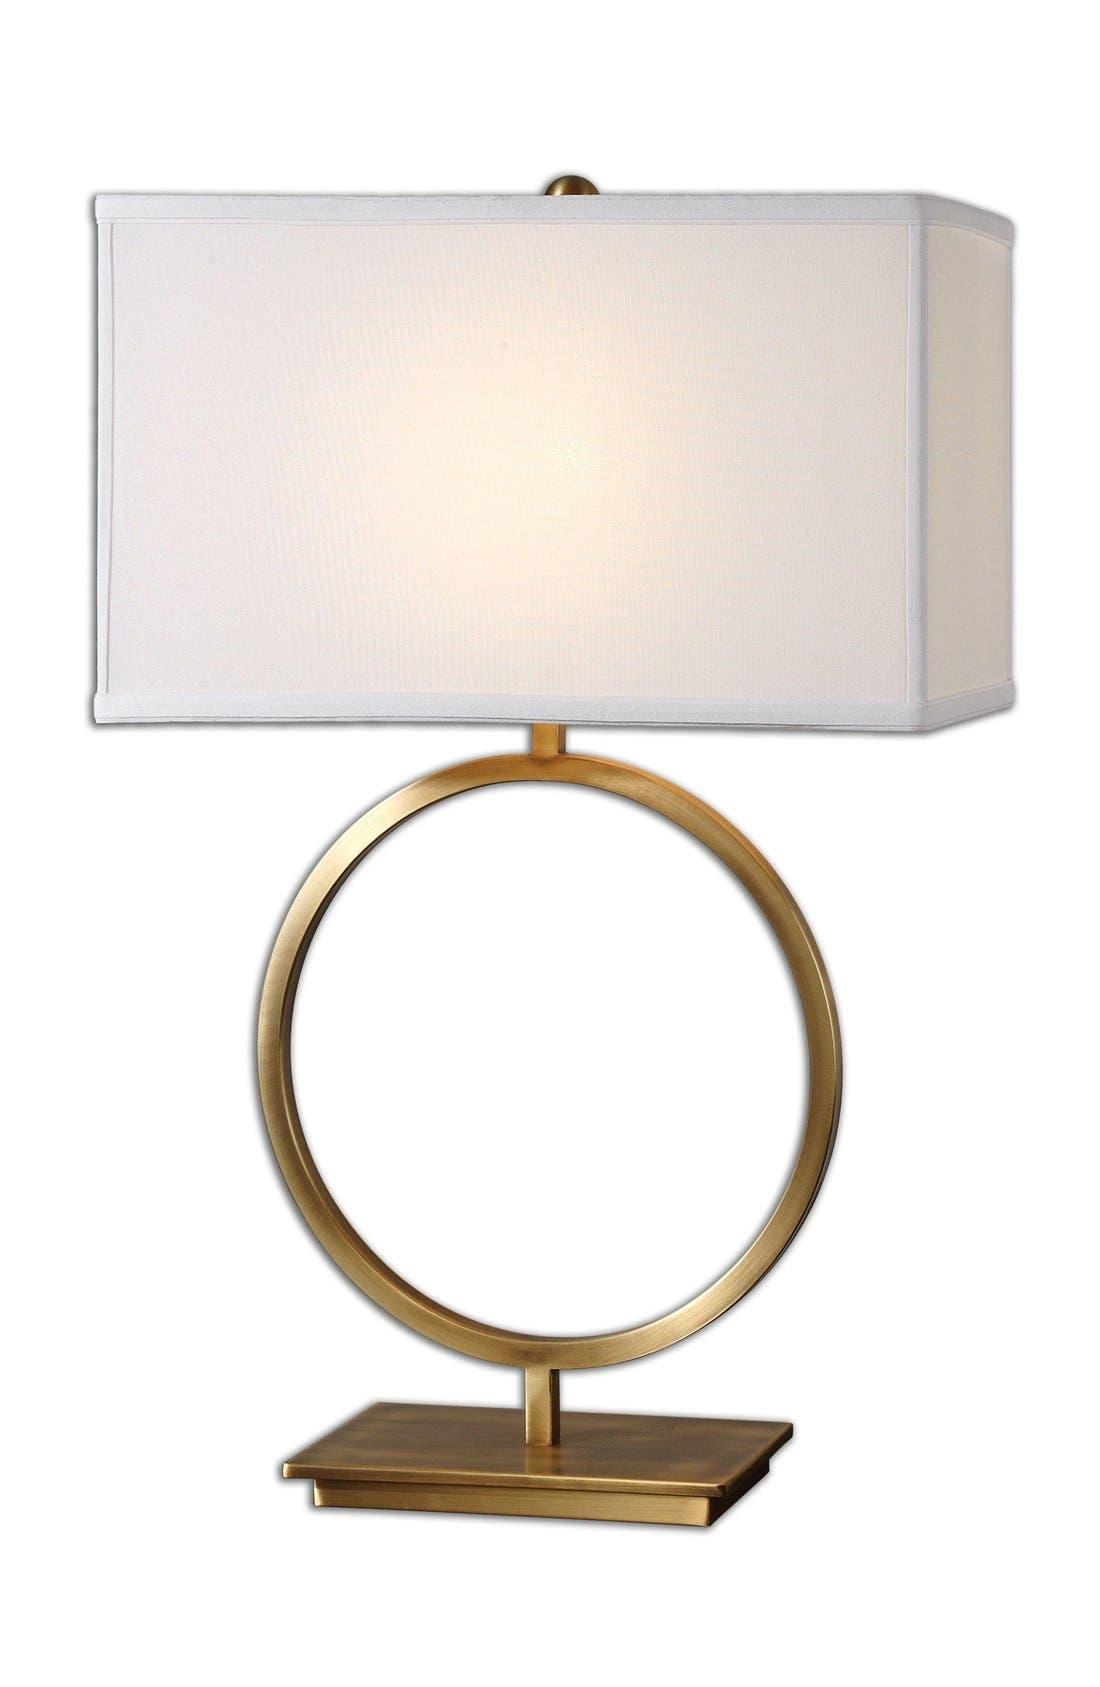 Main Image - Uttermost 'Duara' Circle Table Lamp